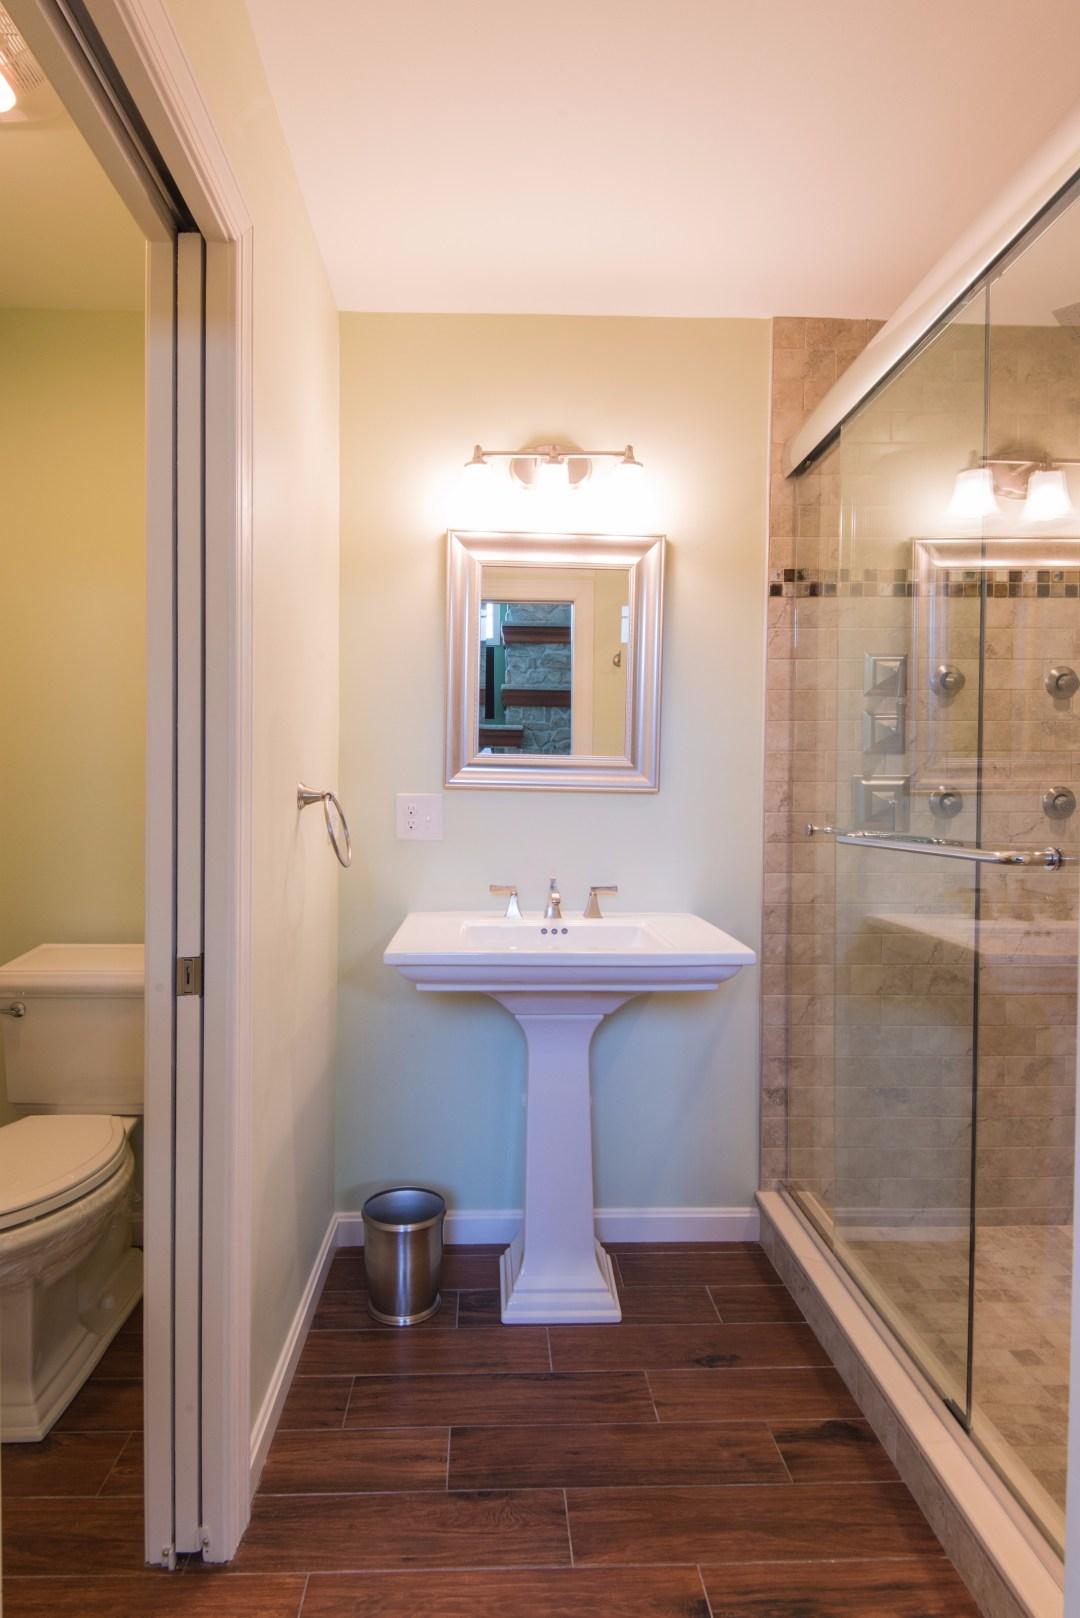 Bathroom Remodel in October Glory, Bear Trap Dunes, Ocean View DE with Dark Wood Floor Tiles and Memoirs Pedestal Sink